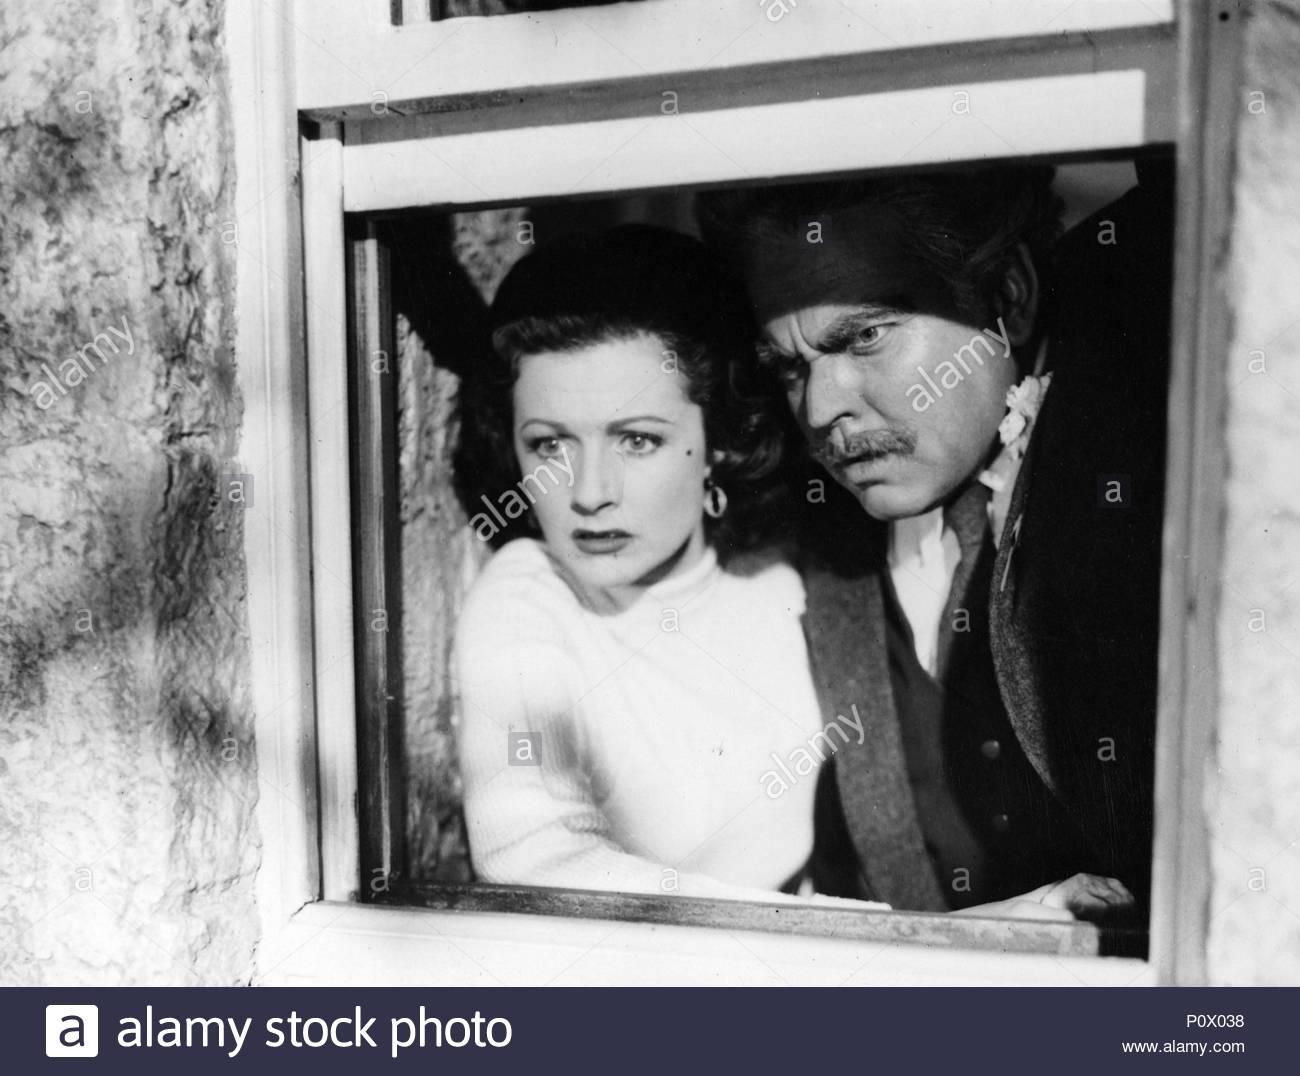 Original Film Title: TROUBLE IN THE GLEN.  English Title: TROUBLE IN THE GLEN.  Film Director: HERBERT WILCOX.  Year: 1954.  Stars: ORSON WELLES; MARGARET LOCKWOOD. Credit: REPUBLIC PICTURES / Album - Stock Image